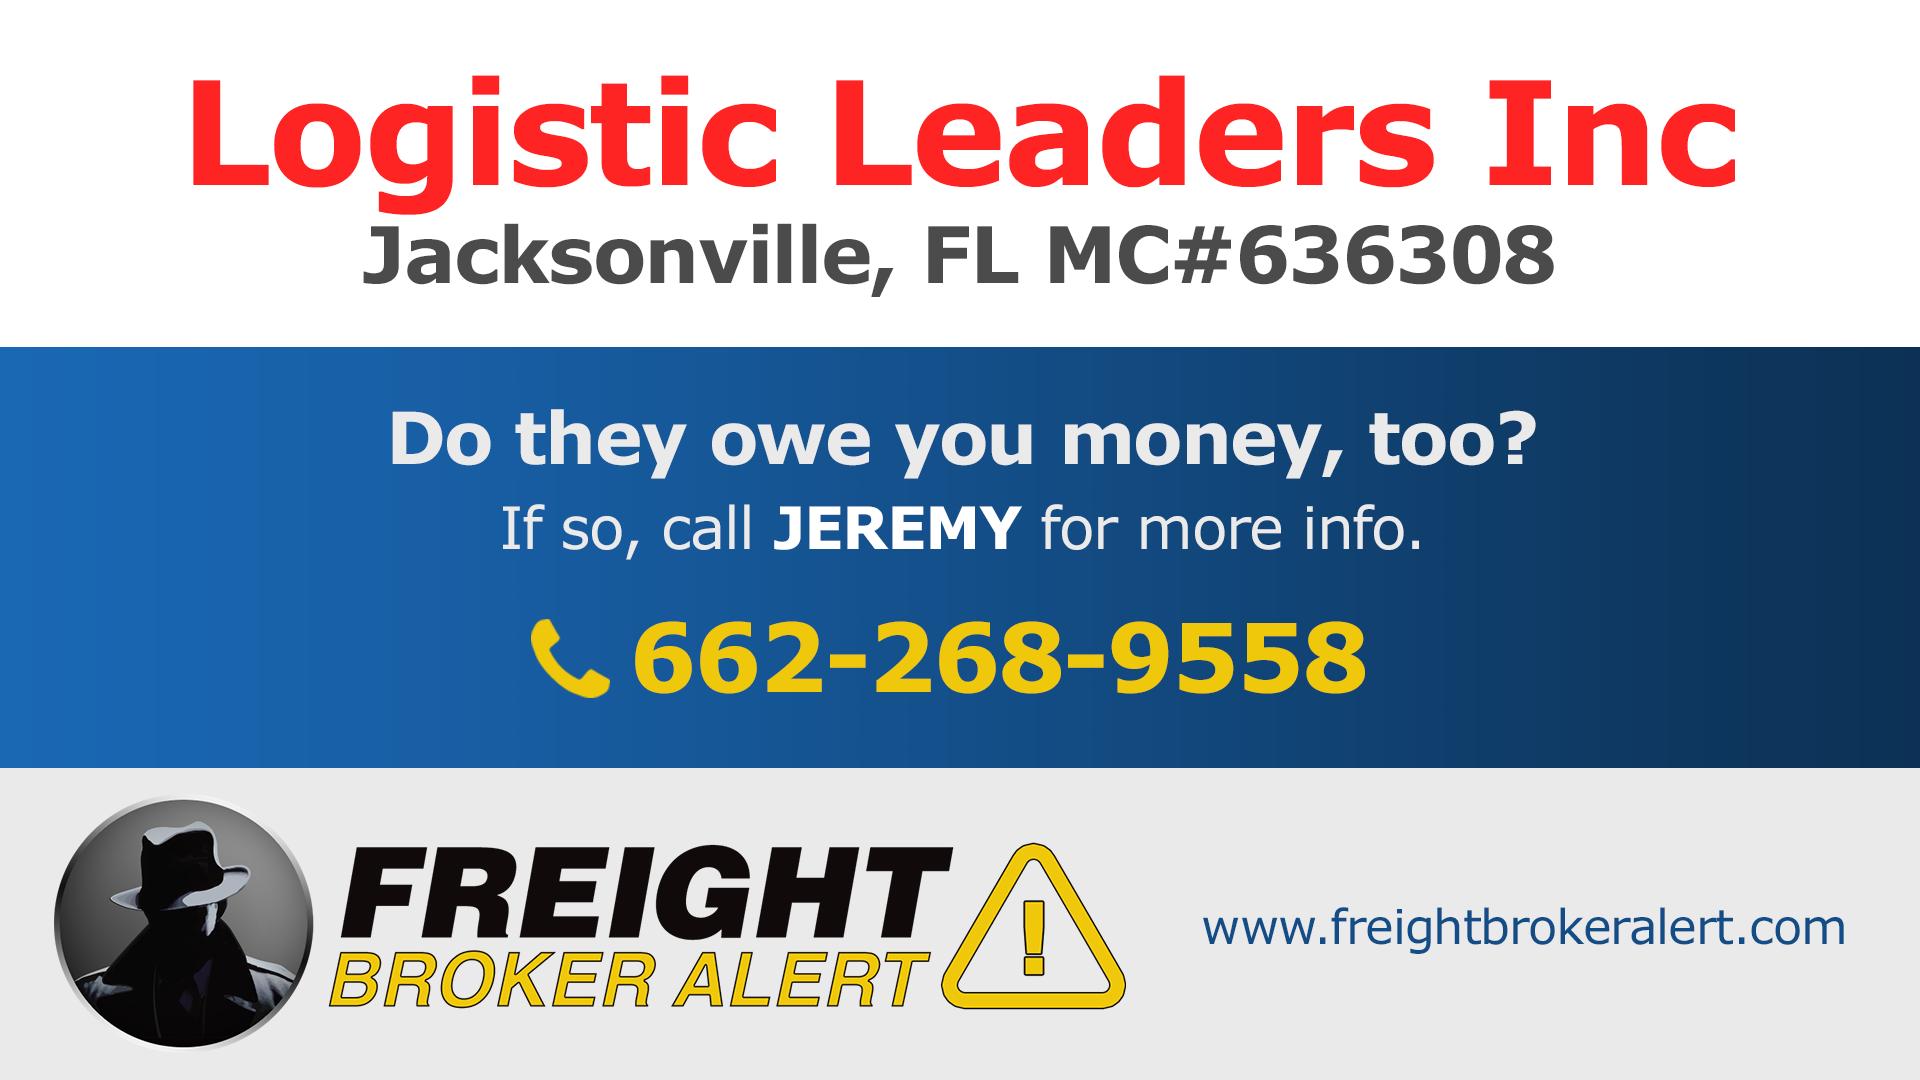 Logistic Leaders Inc Florida